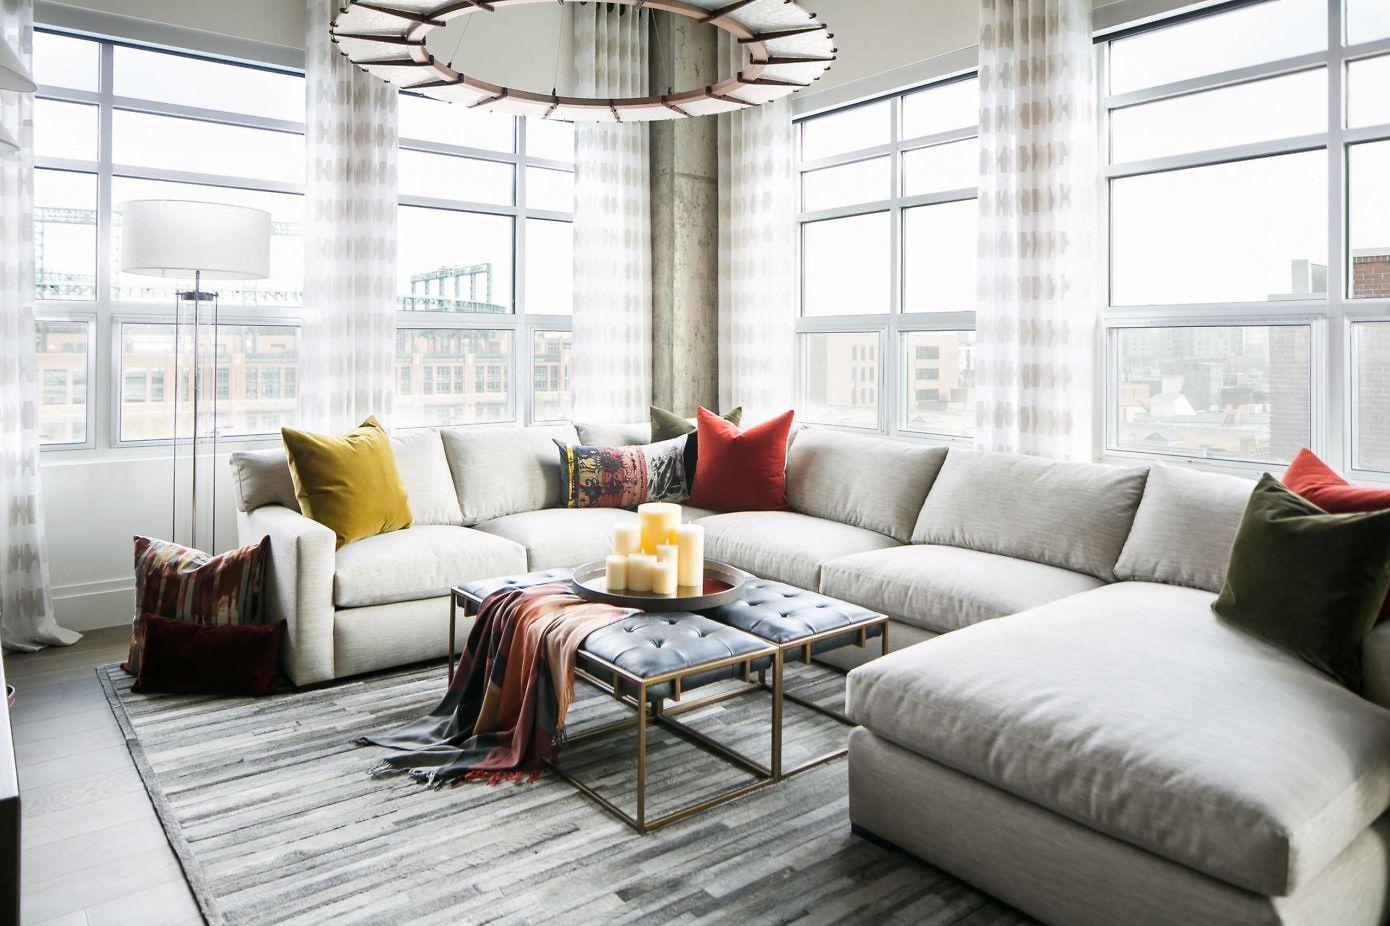 Denver Loft Style Living by Robeson Design | Denver, Lofts and ...